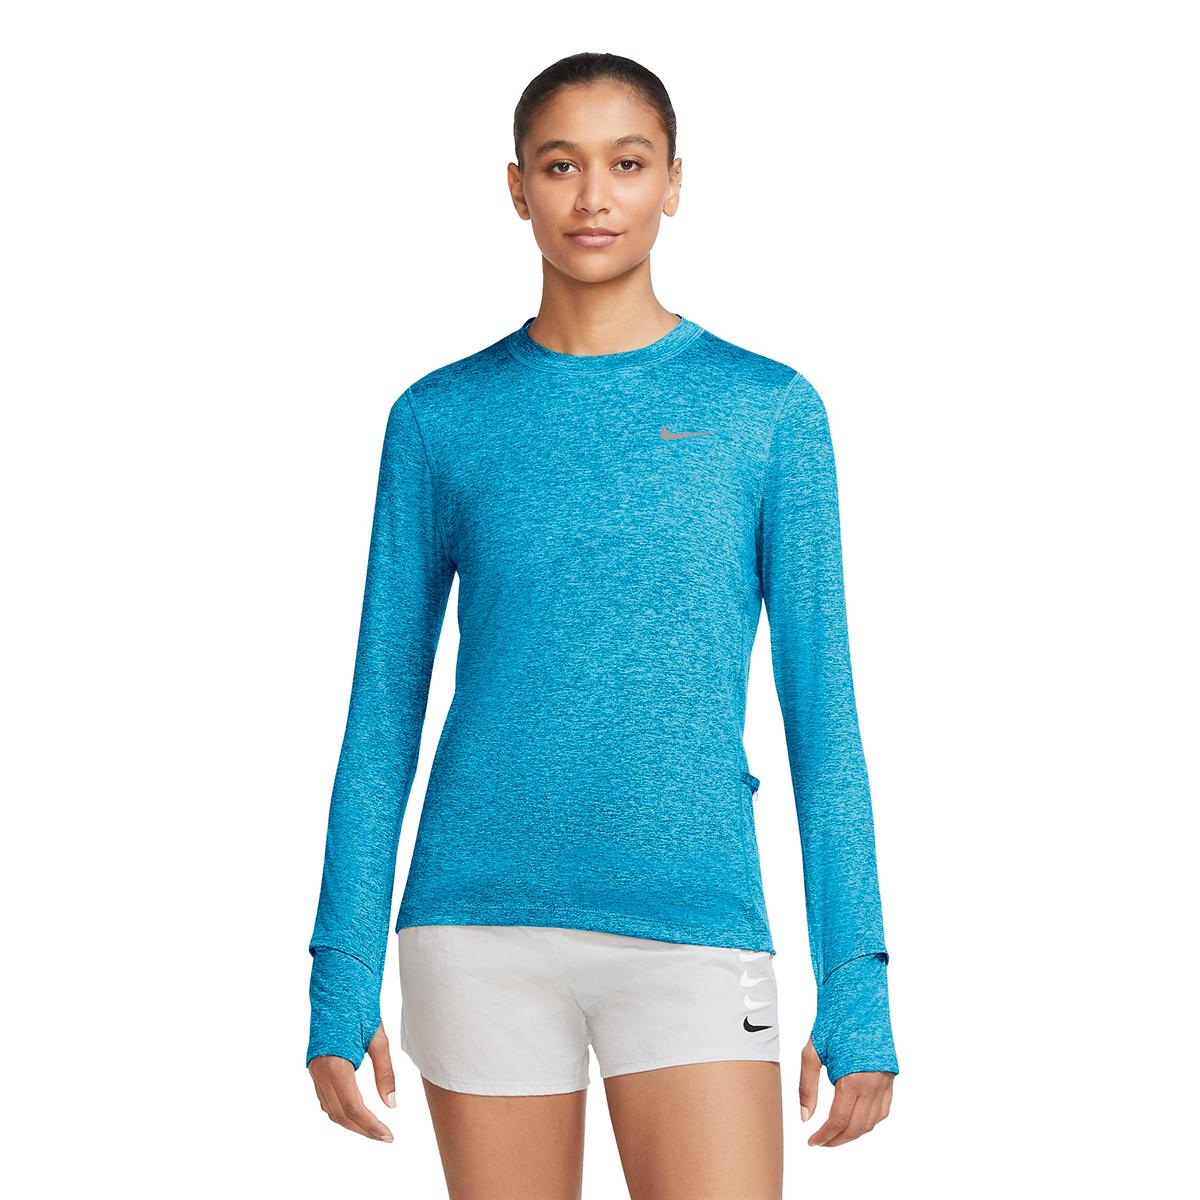 Women's Nike Element Crew Long Sleeve Shirt - Color: Lazer Blue/Glacier Ice - Size: XS, Lazer Blue/Glacier Ice, large, image 1